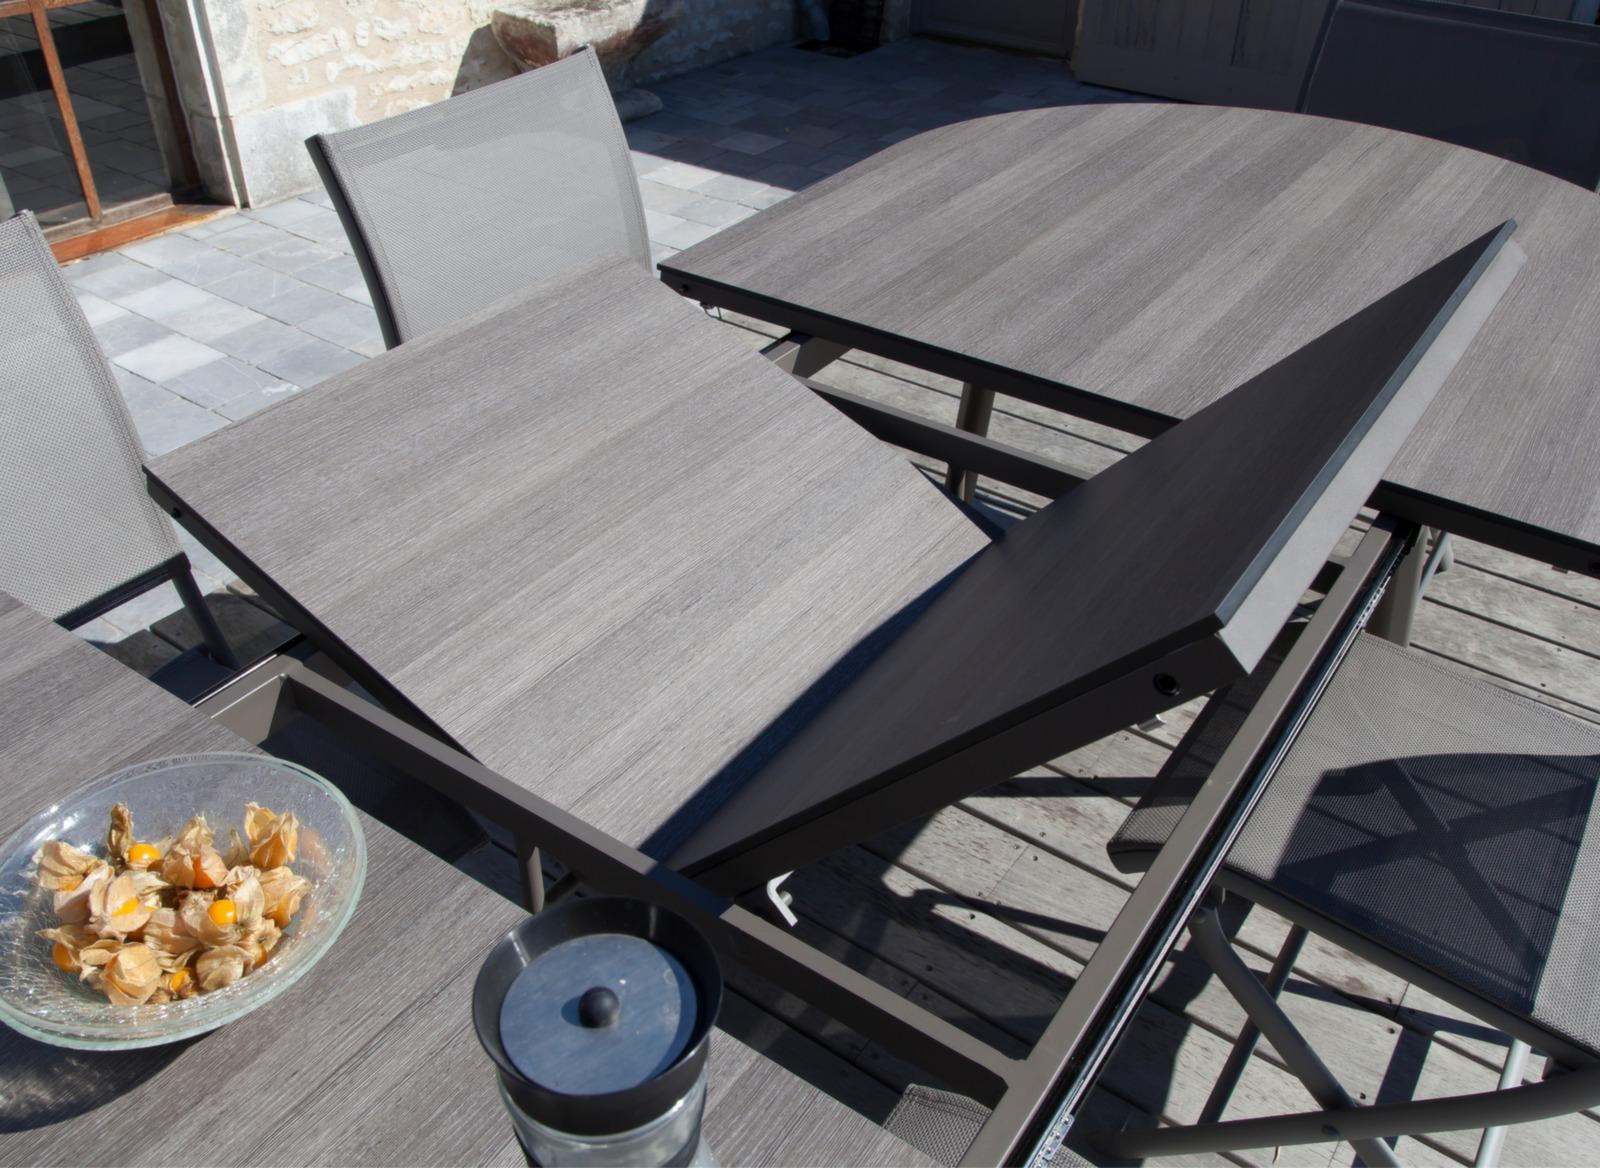 Table de jardin ovale 10 pers bilbao trespa gamme oc o for Table rallonge 12 personnes